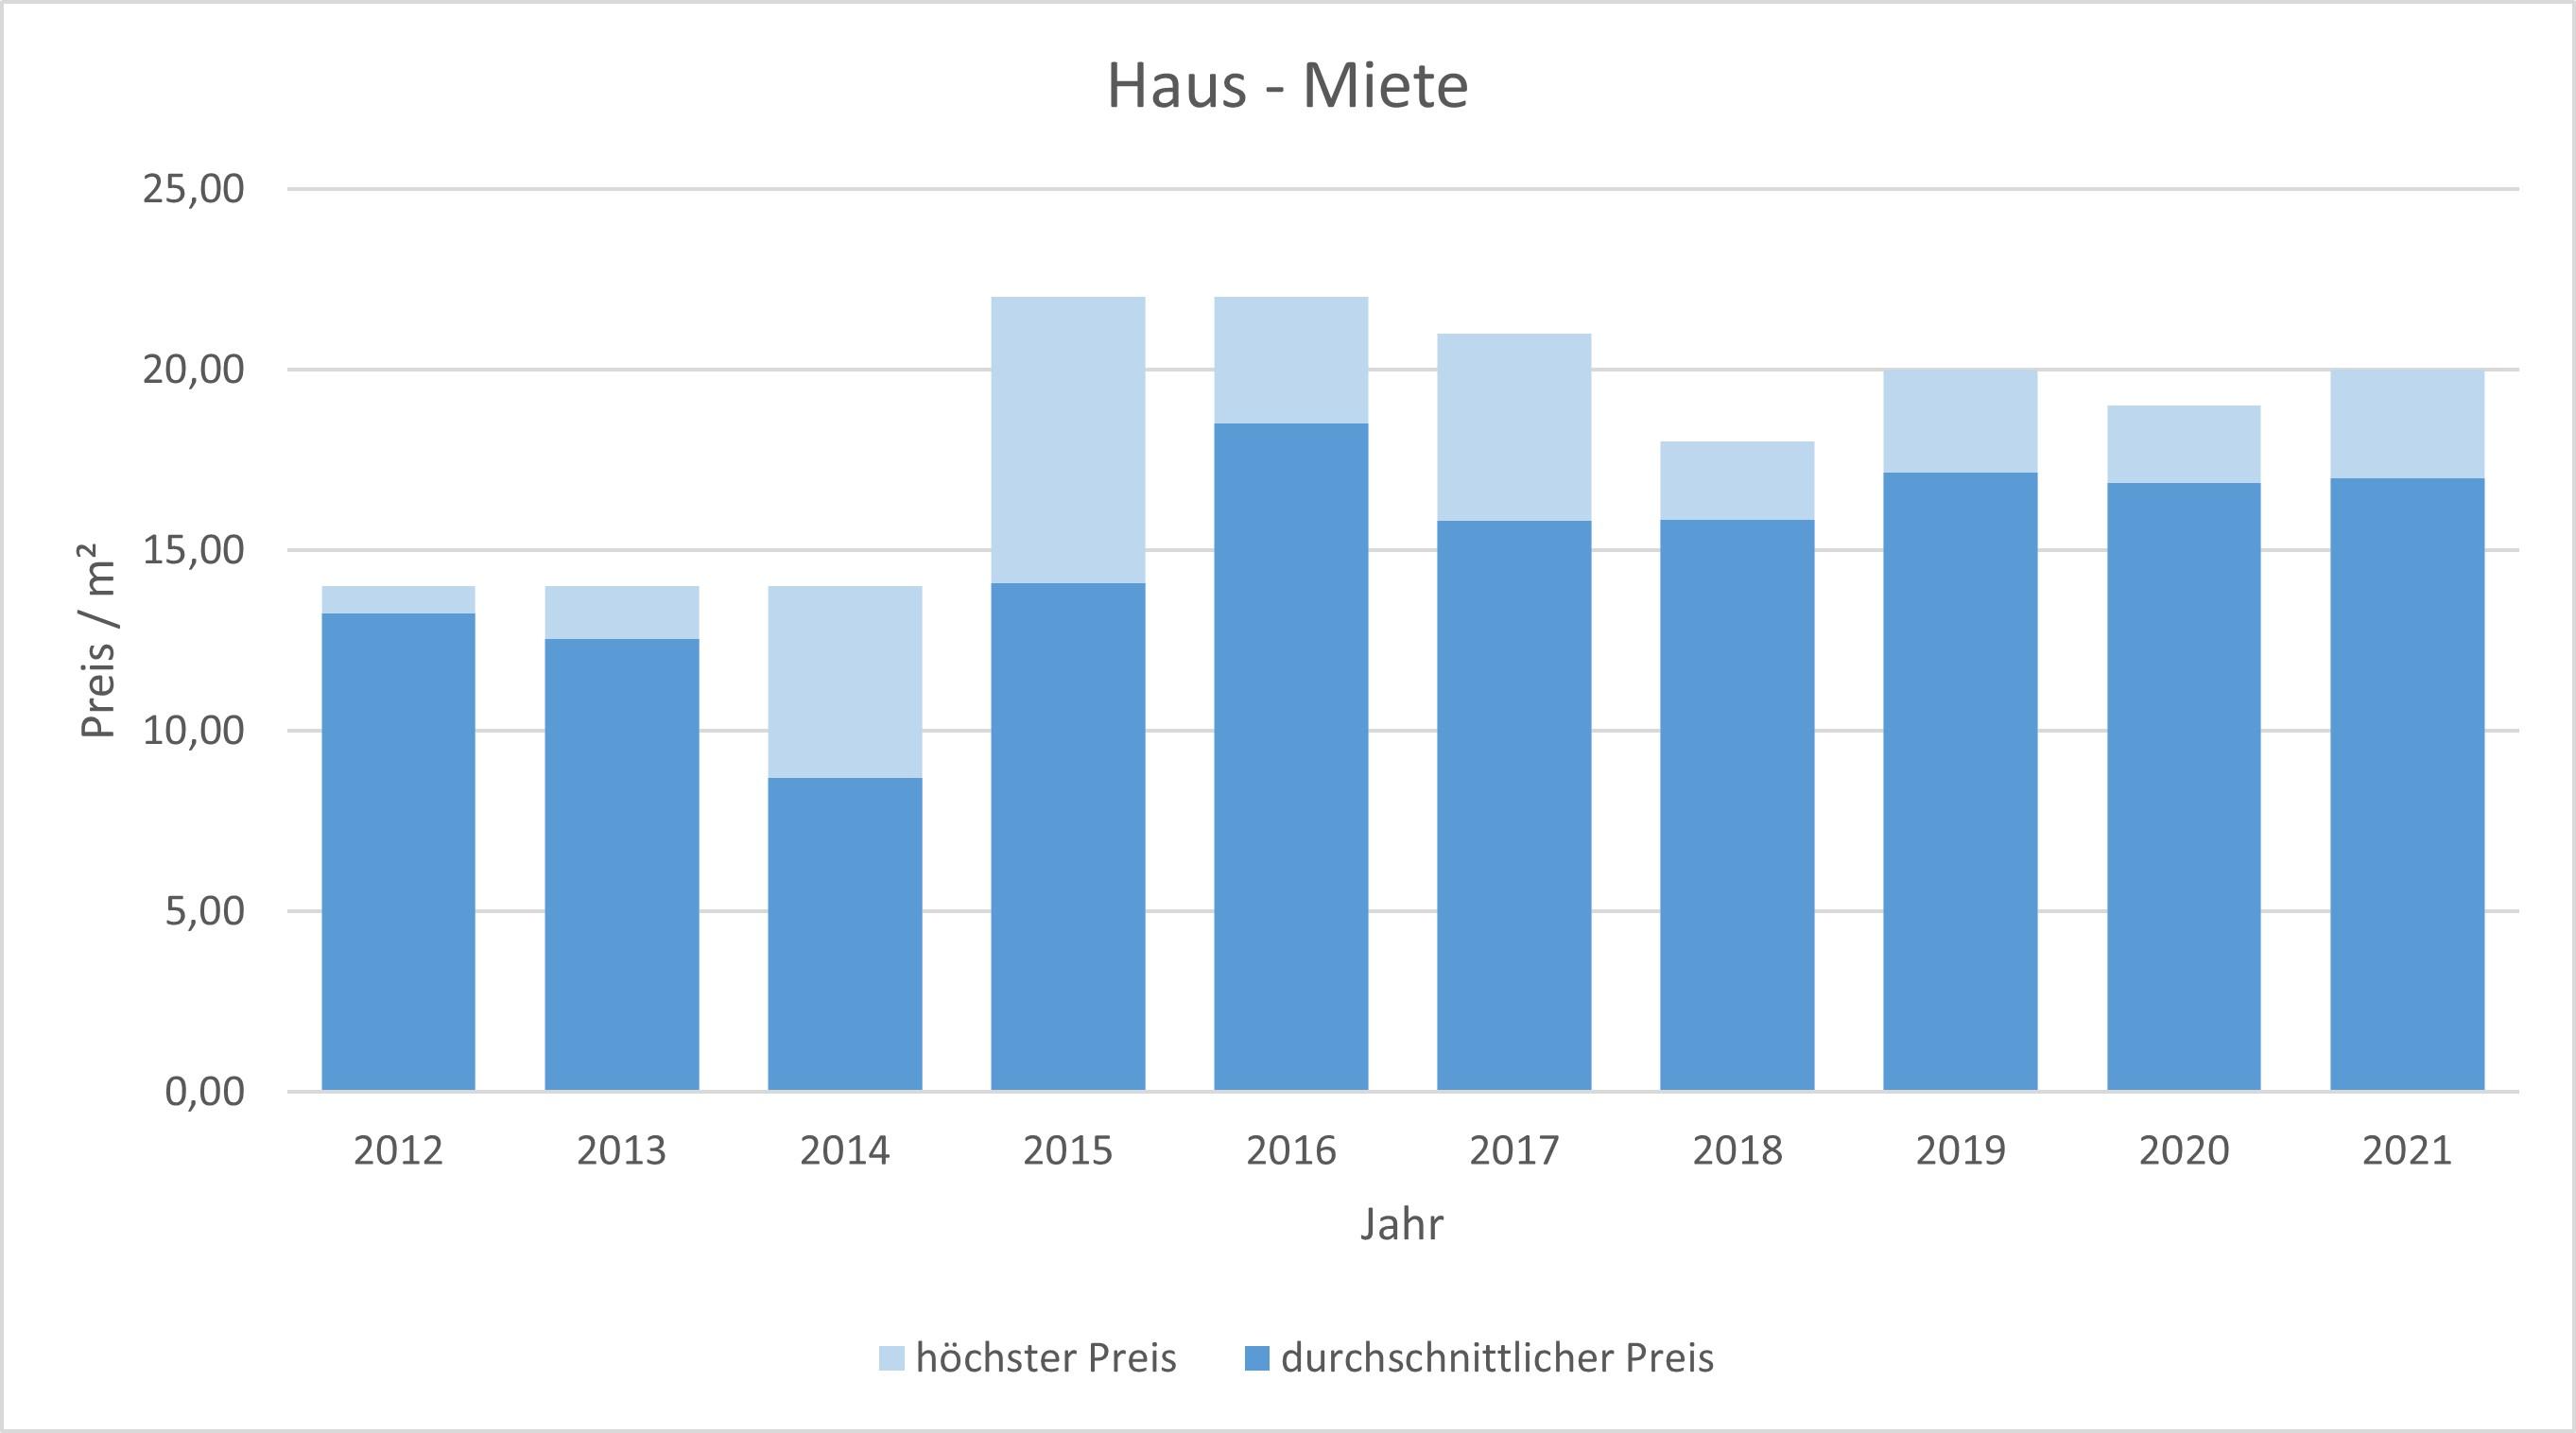 München - Riem Haus mieten vermieten Preis Bewertung Makler www.happy-immo.de 2019 2020 2021